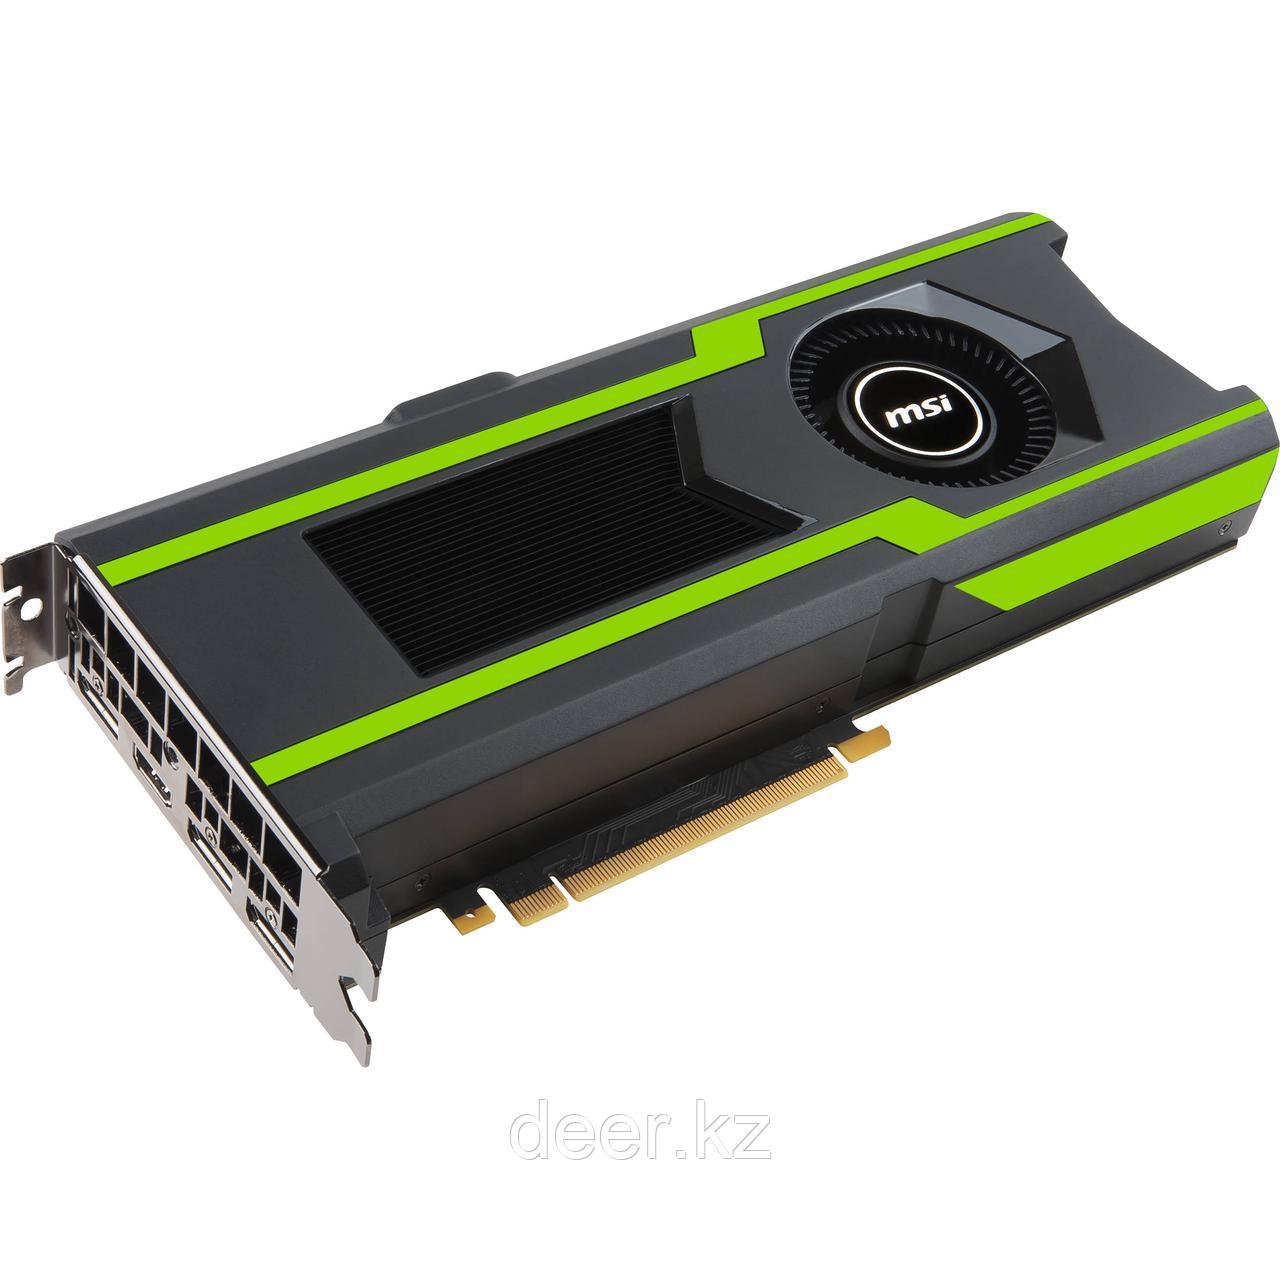 Видеокарта MSI GeForce GTX 1080 Ti AERO 11G OC